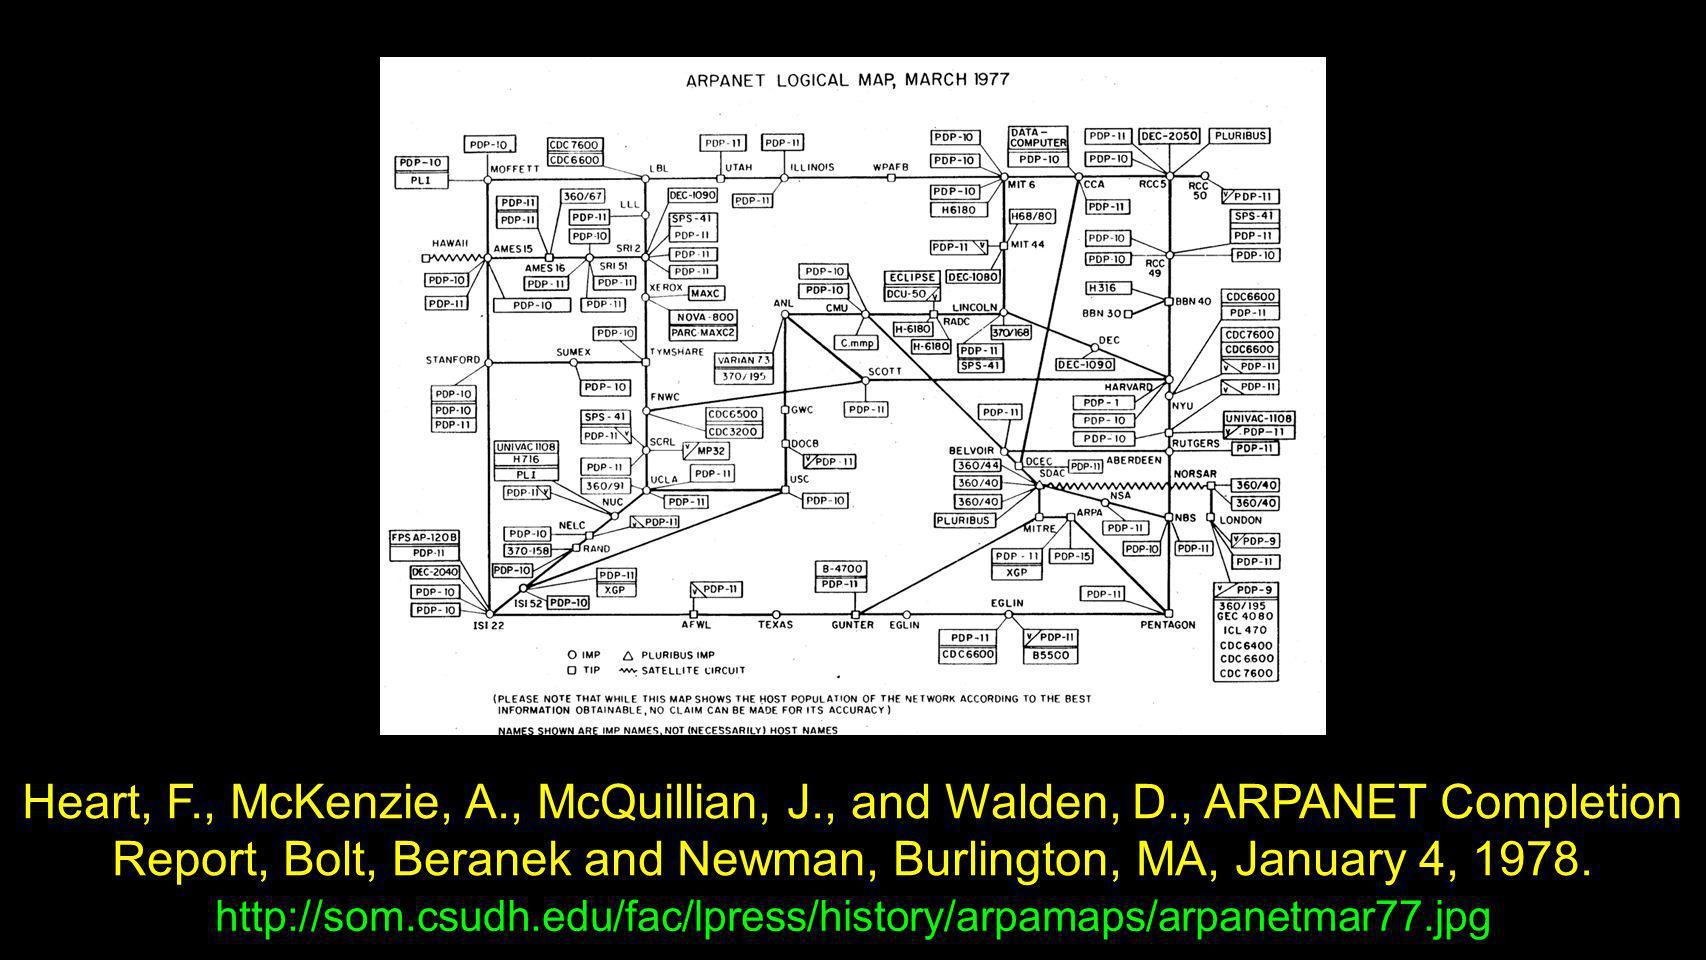 http://som.csudh.edu/fac/lpress/history/arpamaps/arpanetmar77.jpg Heart, F., McKenzie, A., McQuillian, J., and Walden, D., ARPANET Completion Report,